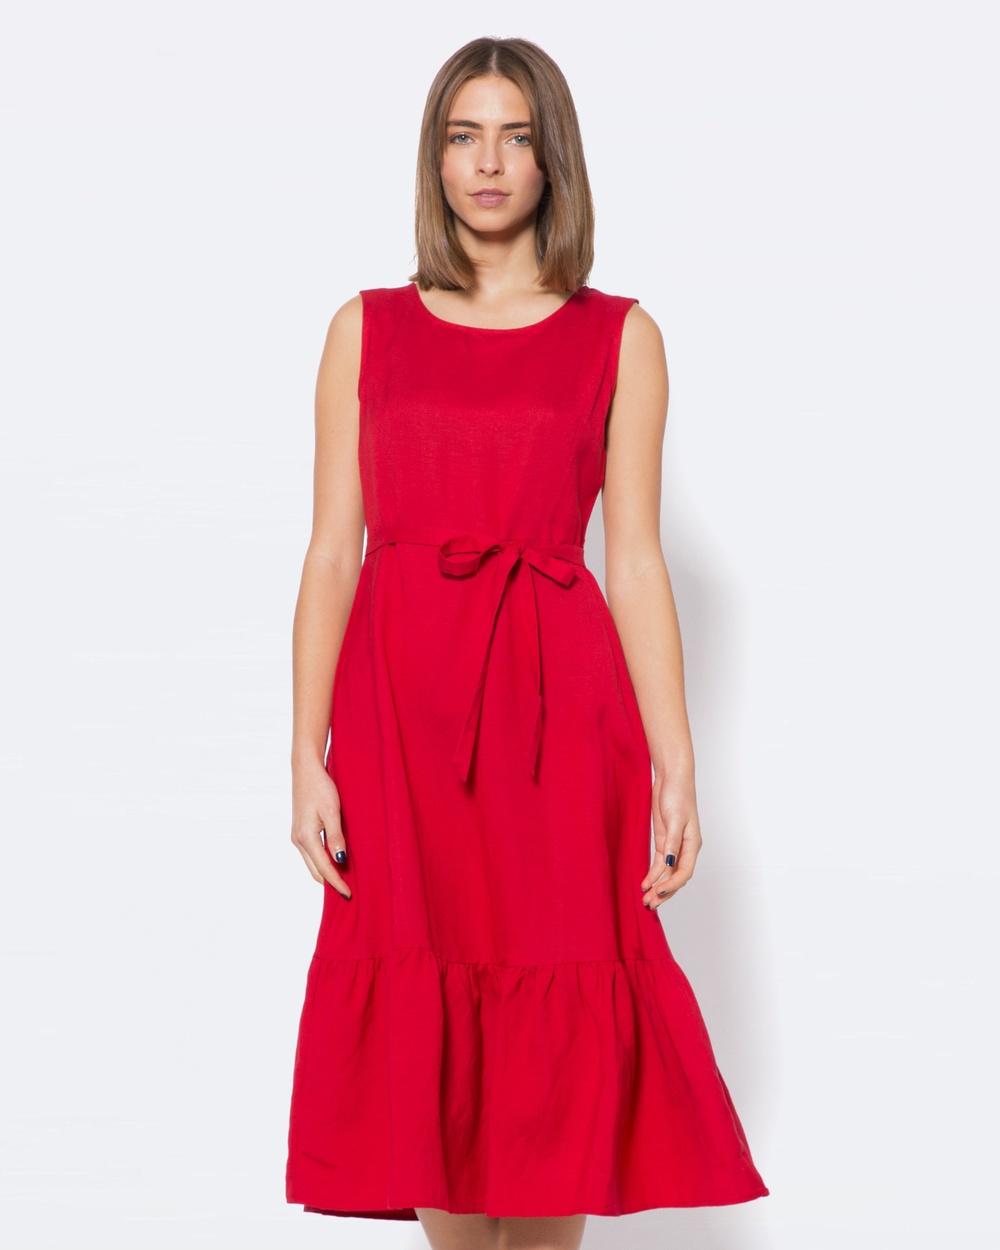 Princess Highway Annalise Dress Dresses Red Annalise Dress